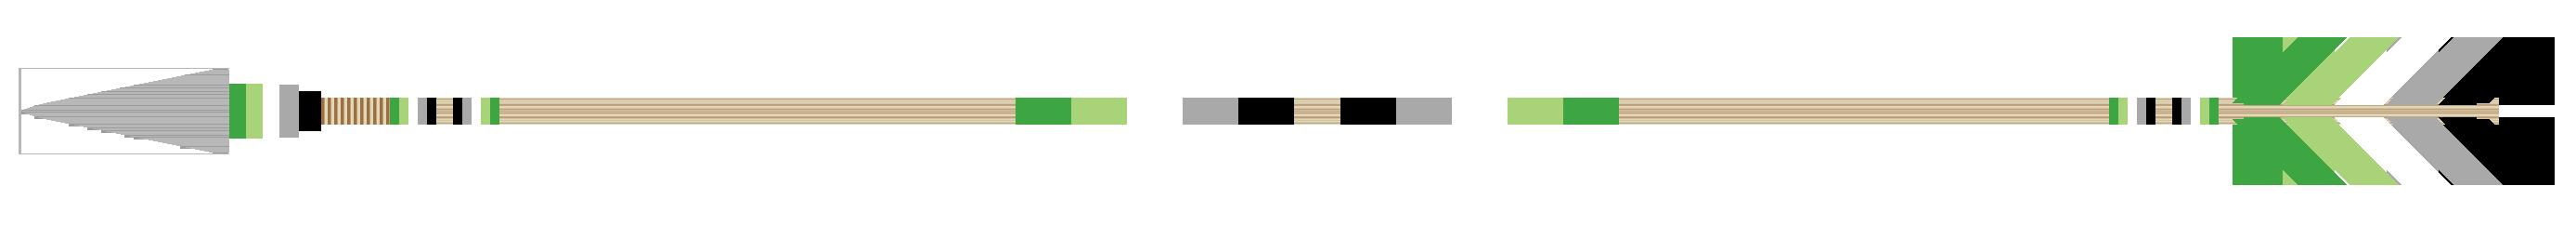 Arrow Divider - Aromantic, Version 2, Left